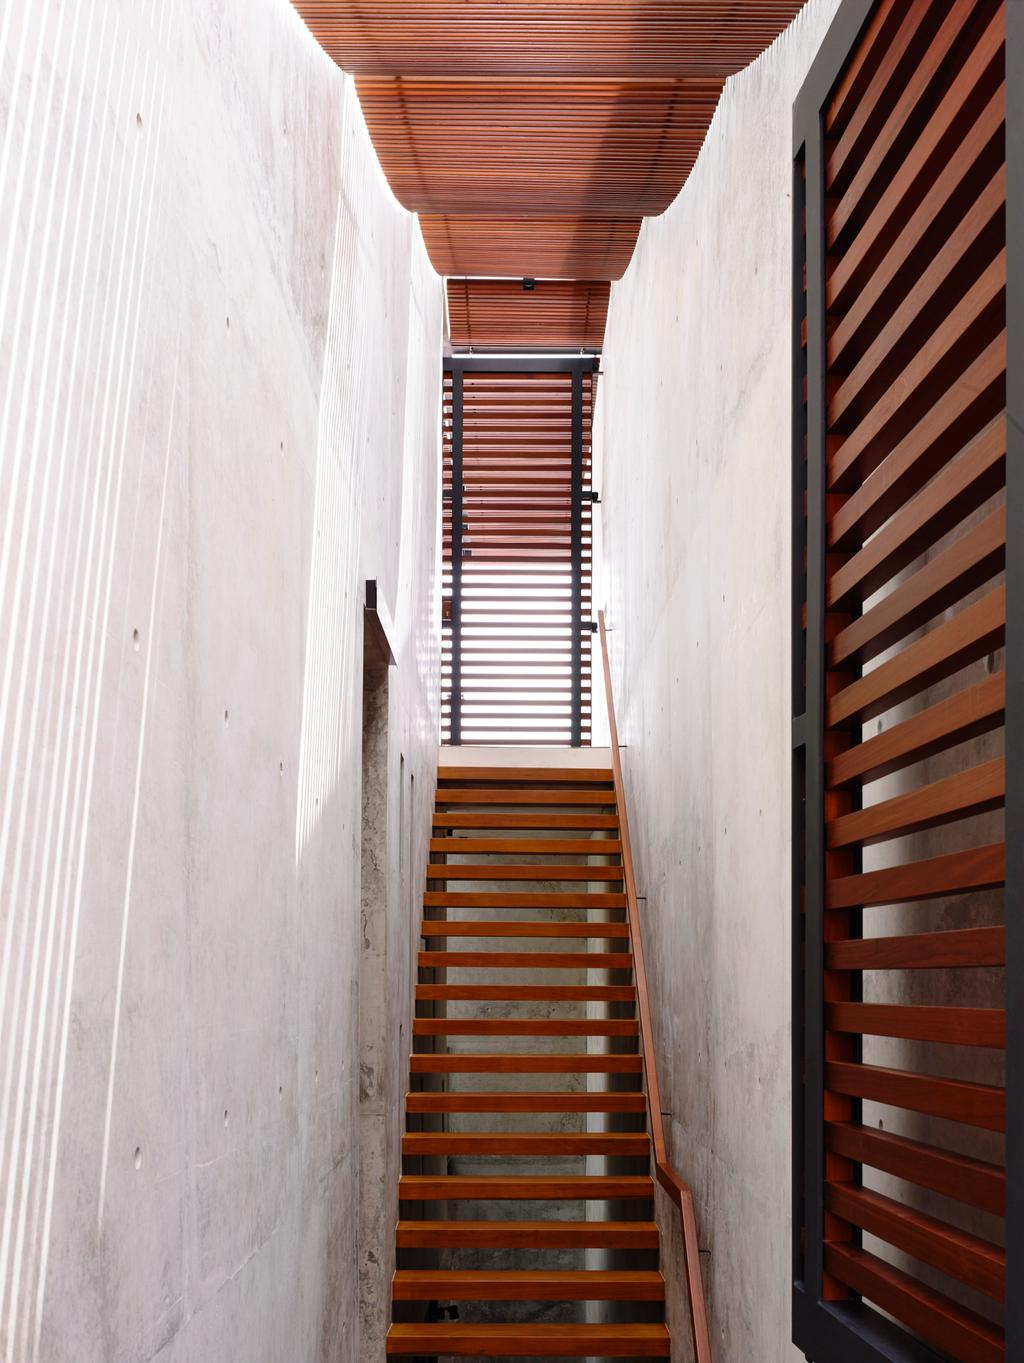 Contemporary, Landed, Belimbing Avenue, Architect, HYLA Architects, Curtain, Home Decor, Shutter, Window, Window Shade